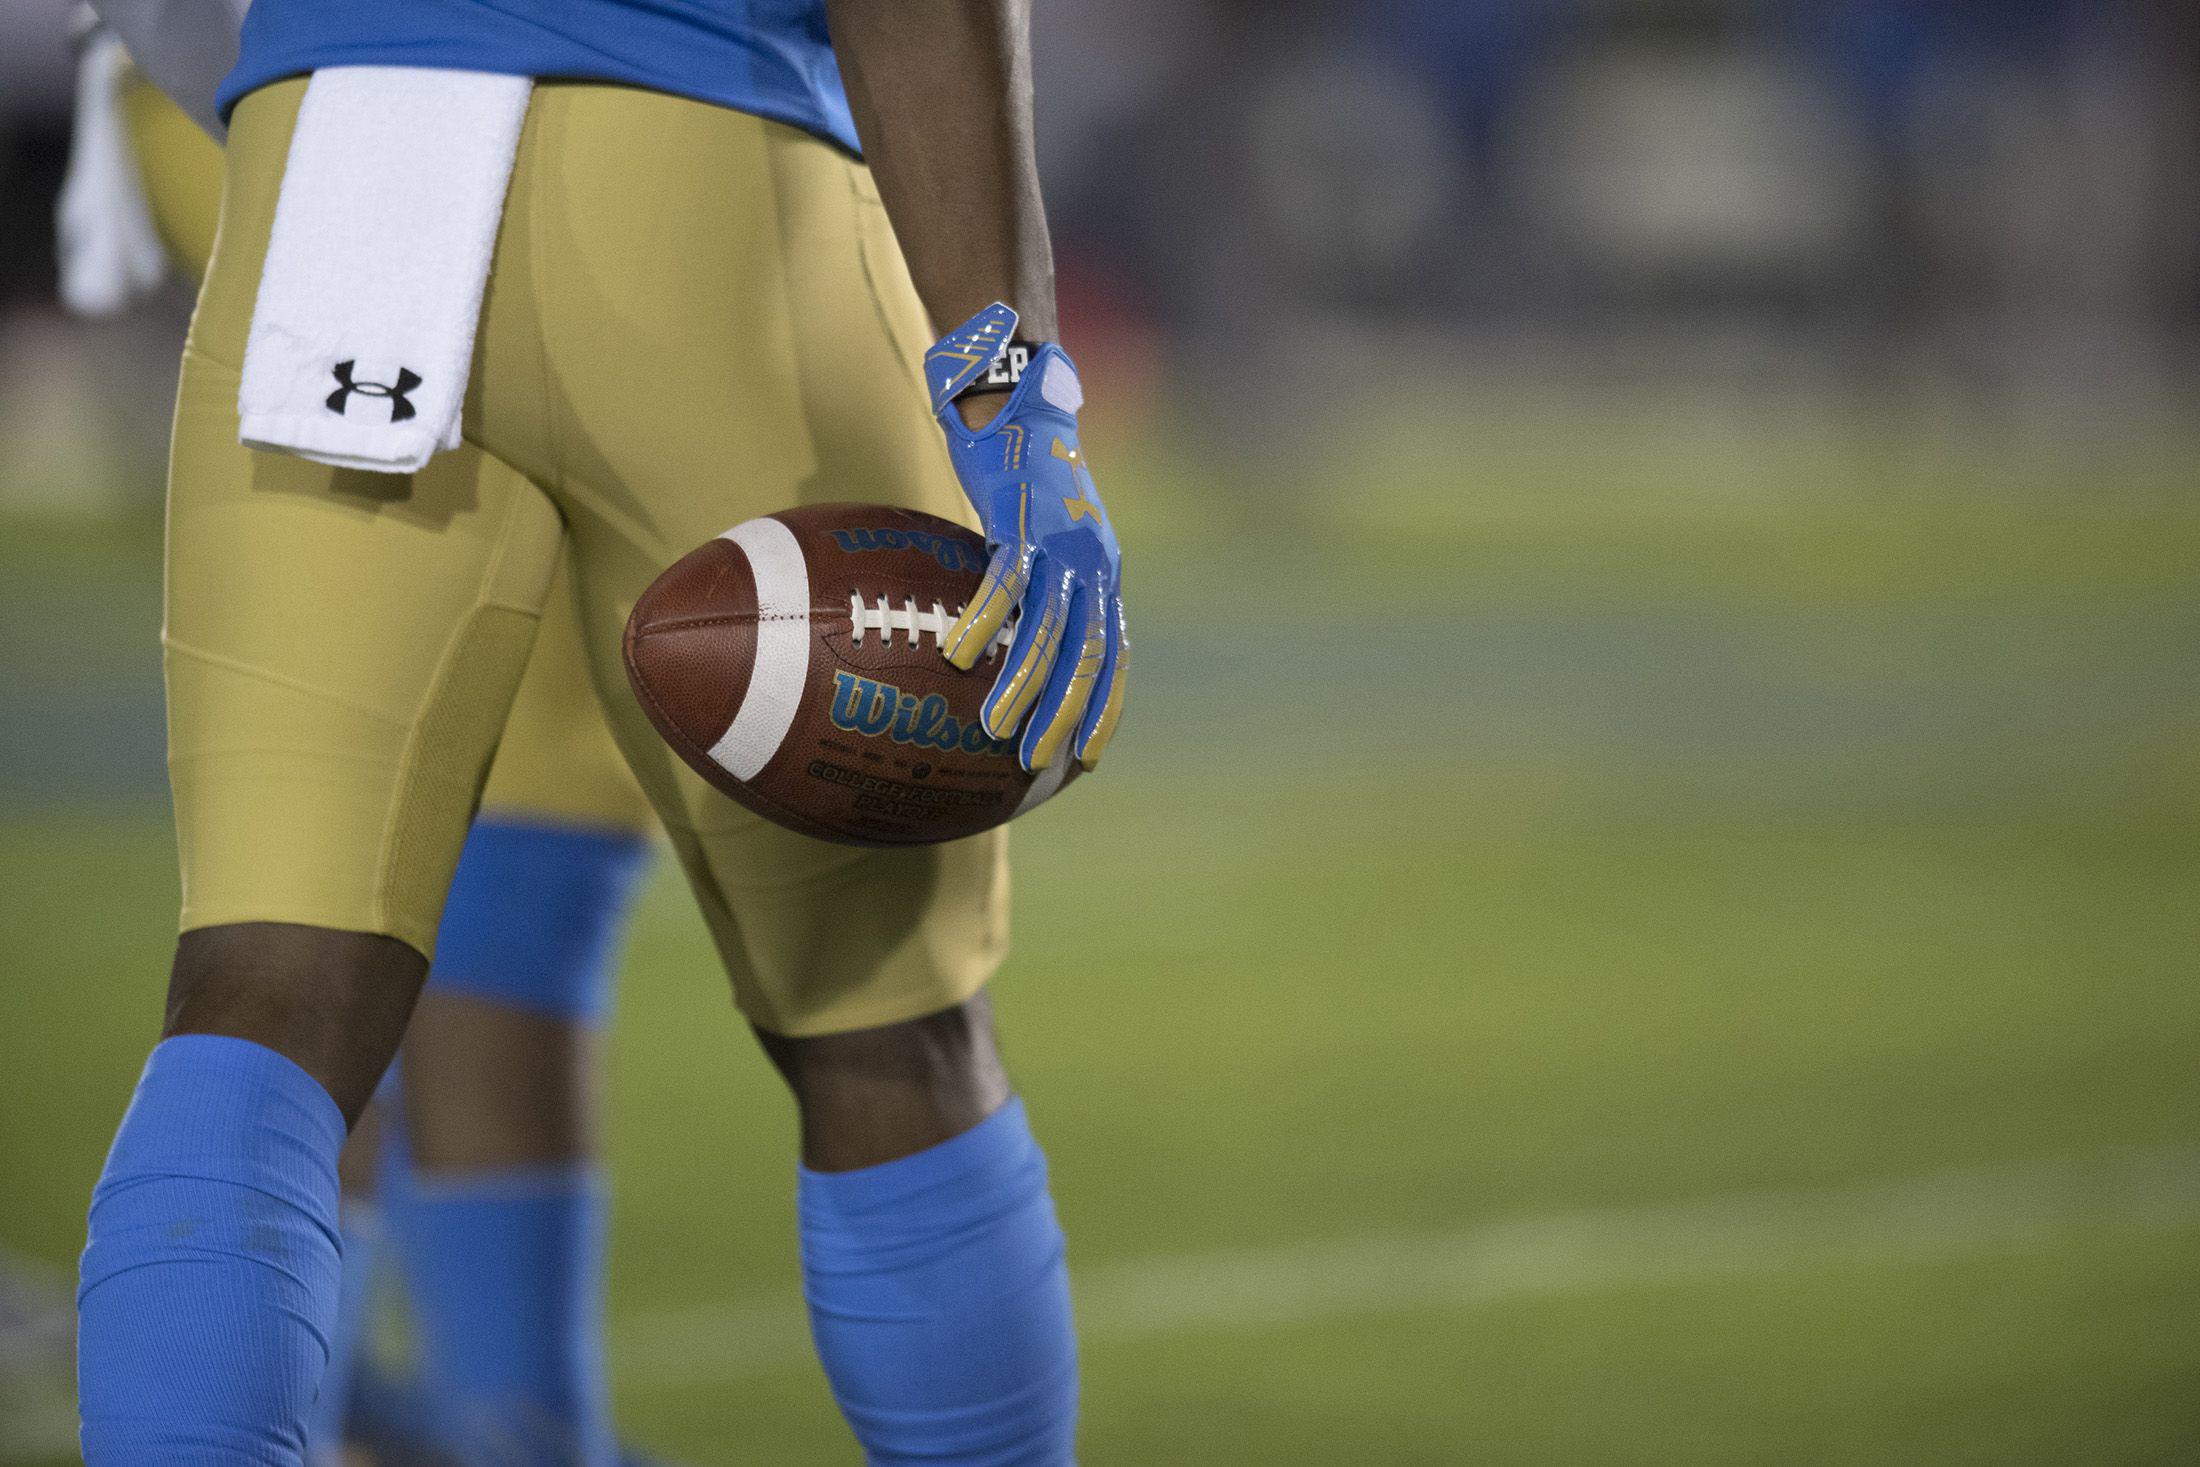 UCLA sues Under Armour for ending $280 million sponsorship